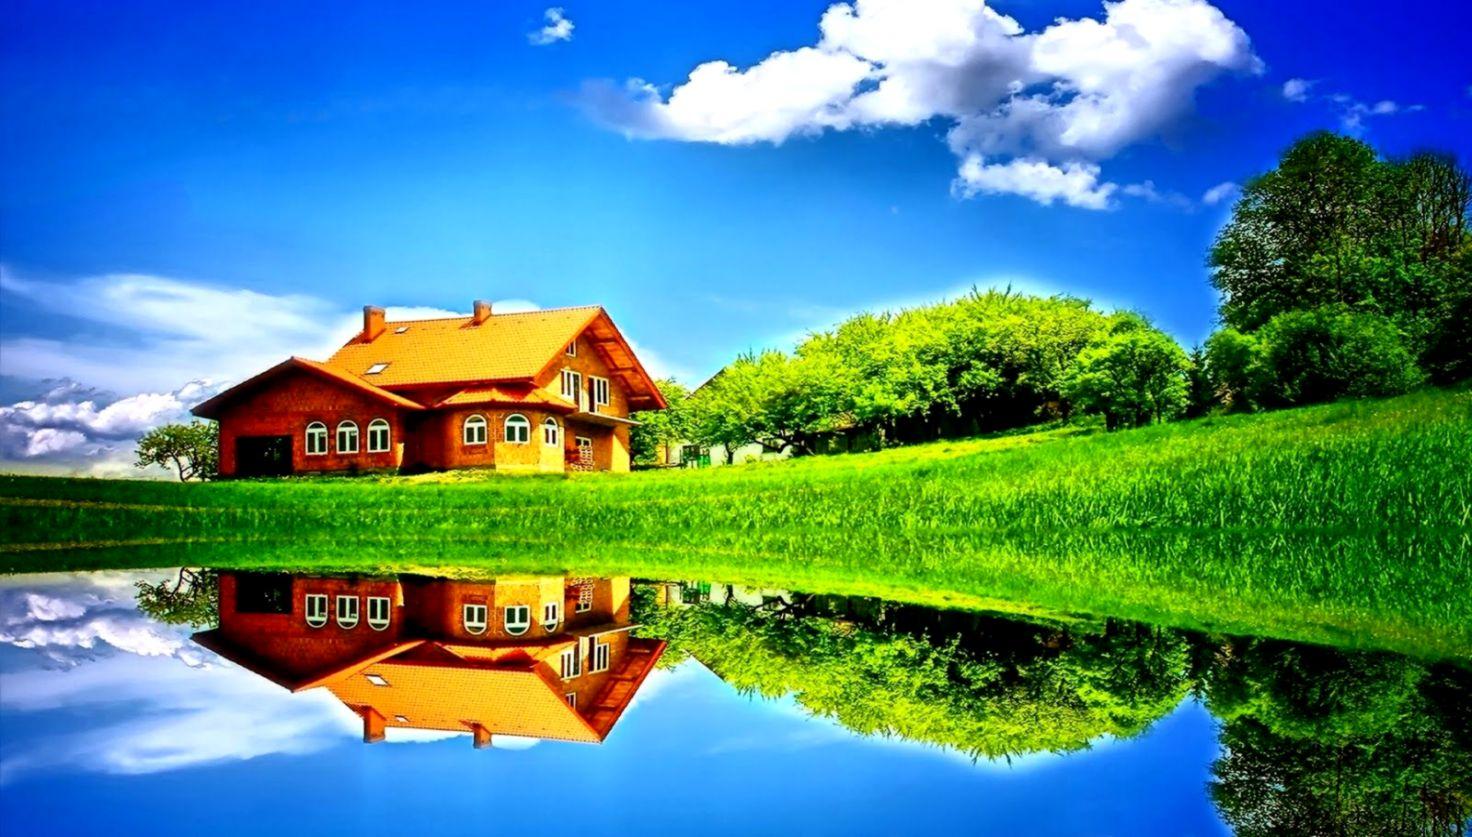 Amazing Nature Background Wallpaper Hd 1080p Best Image